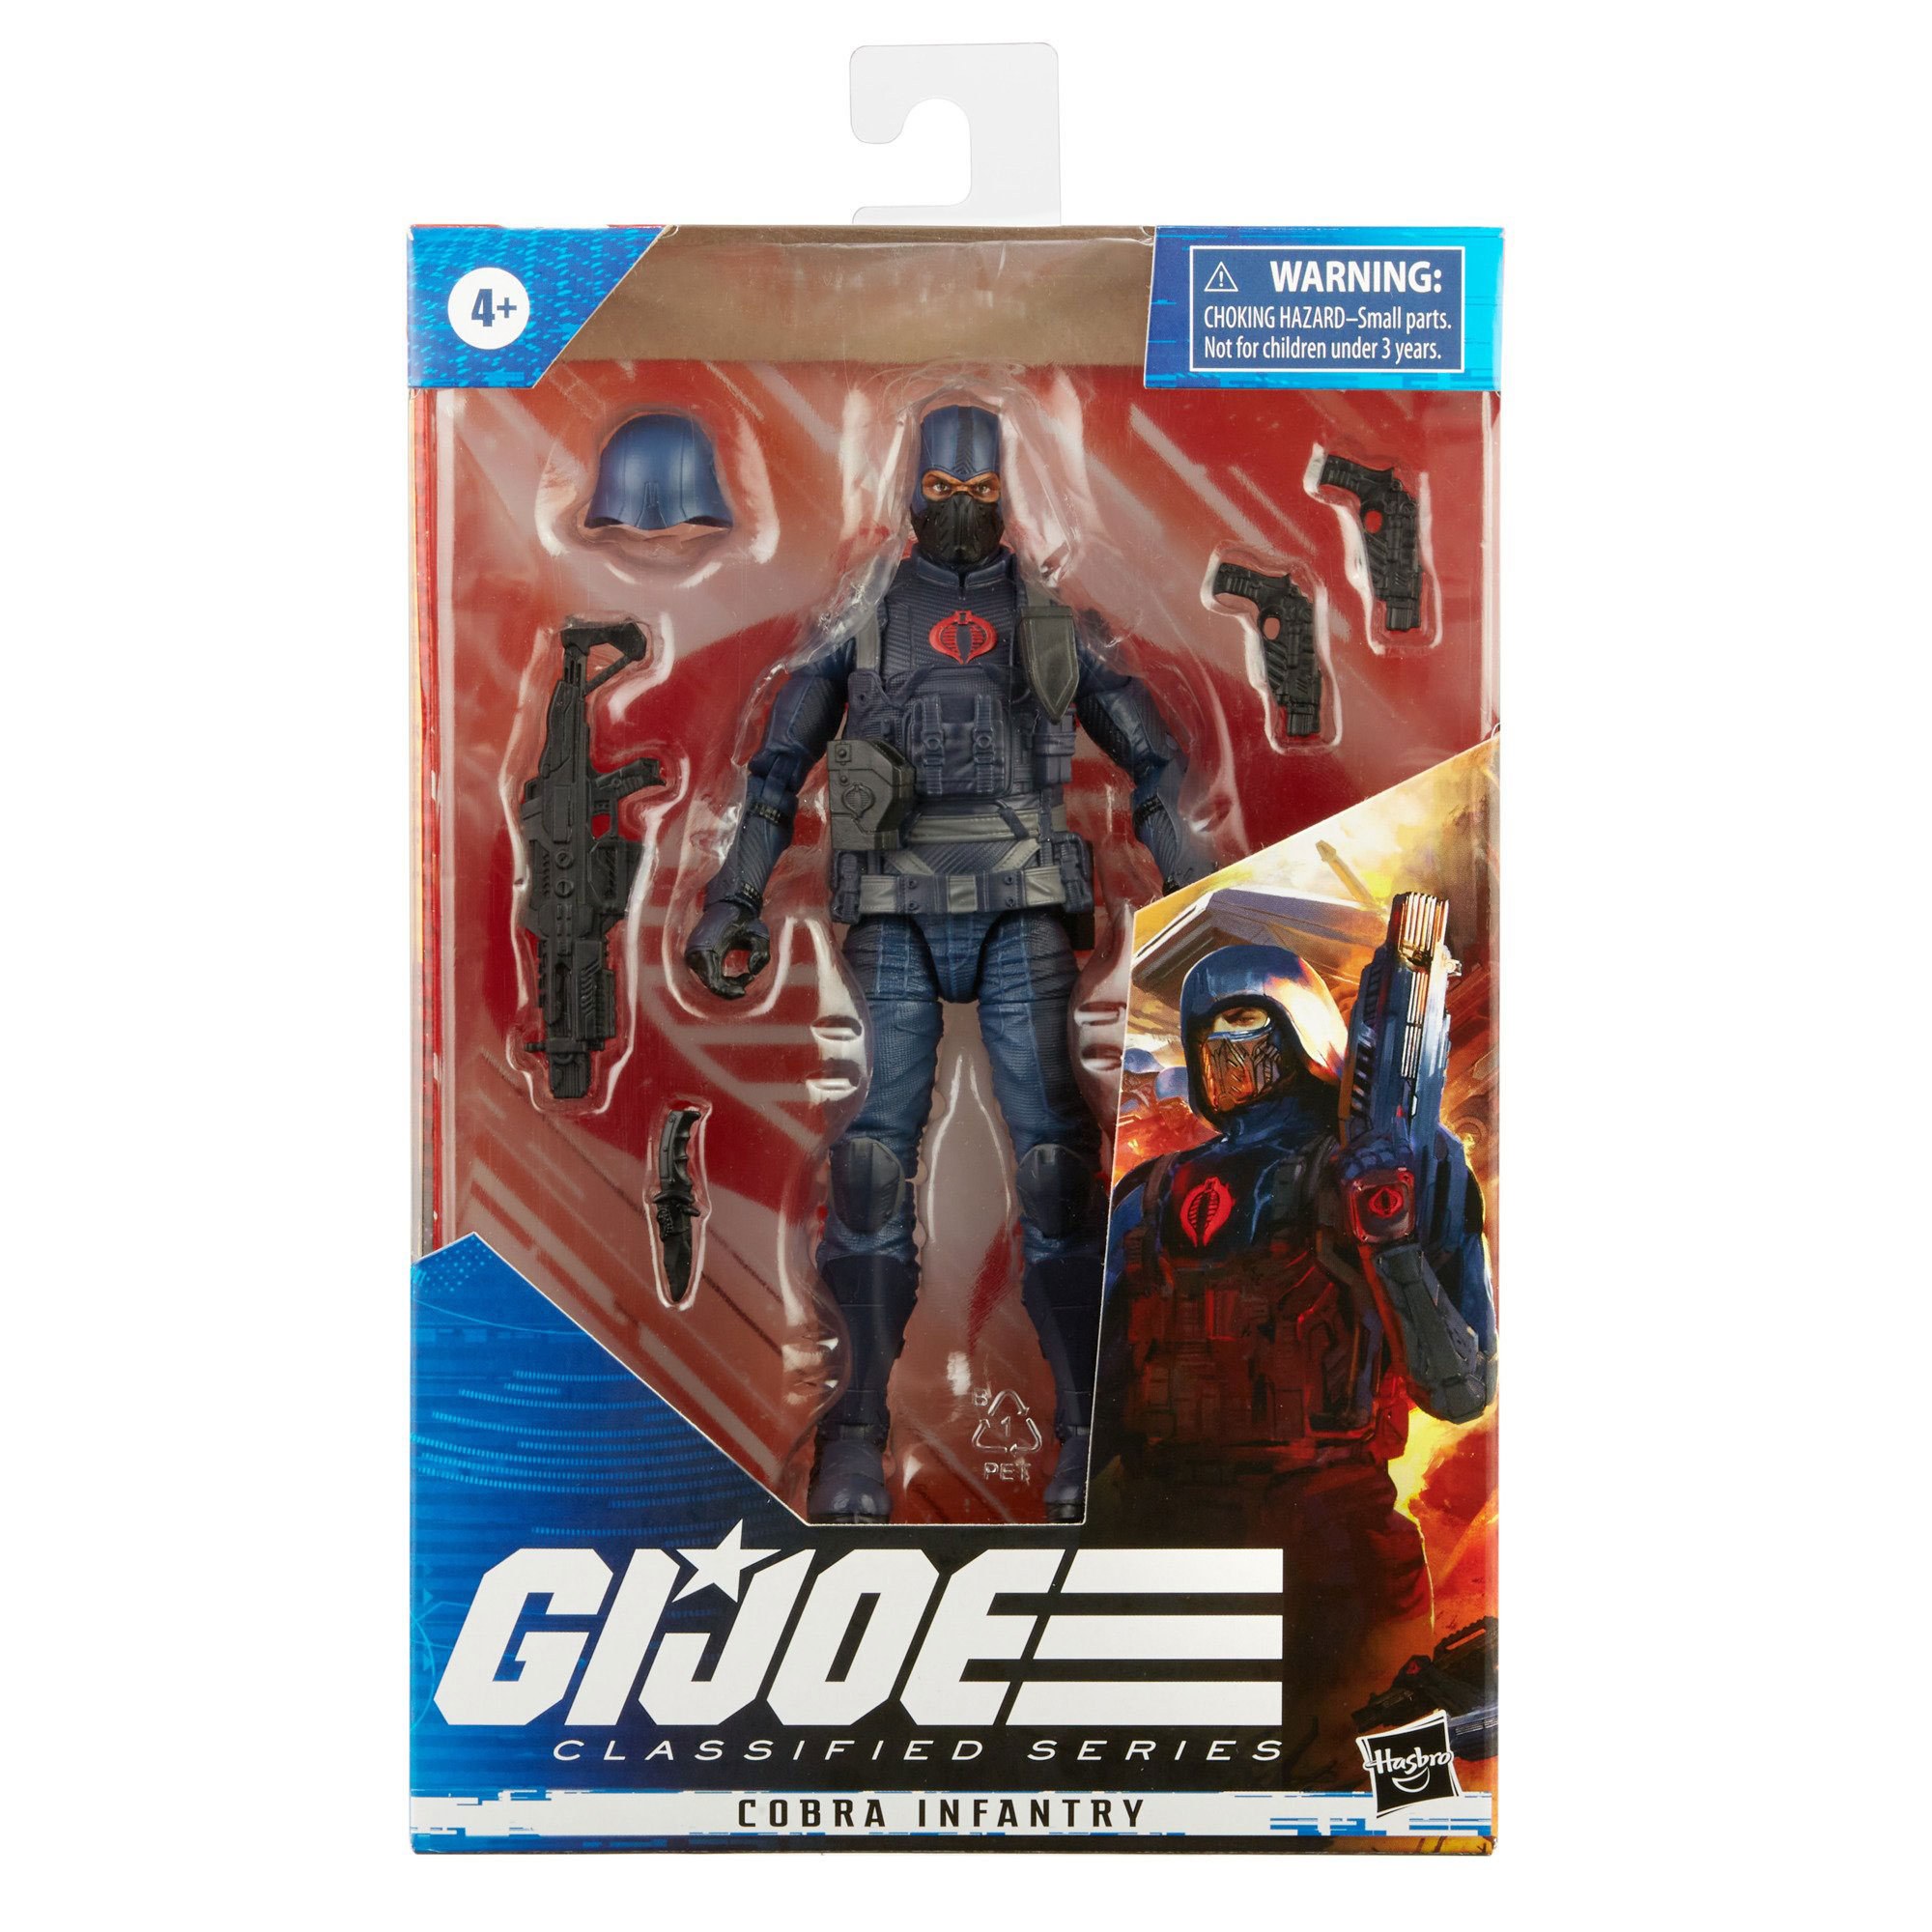 gi-joe-classified-cobra-infantry-action-figure-packaging